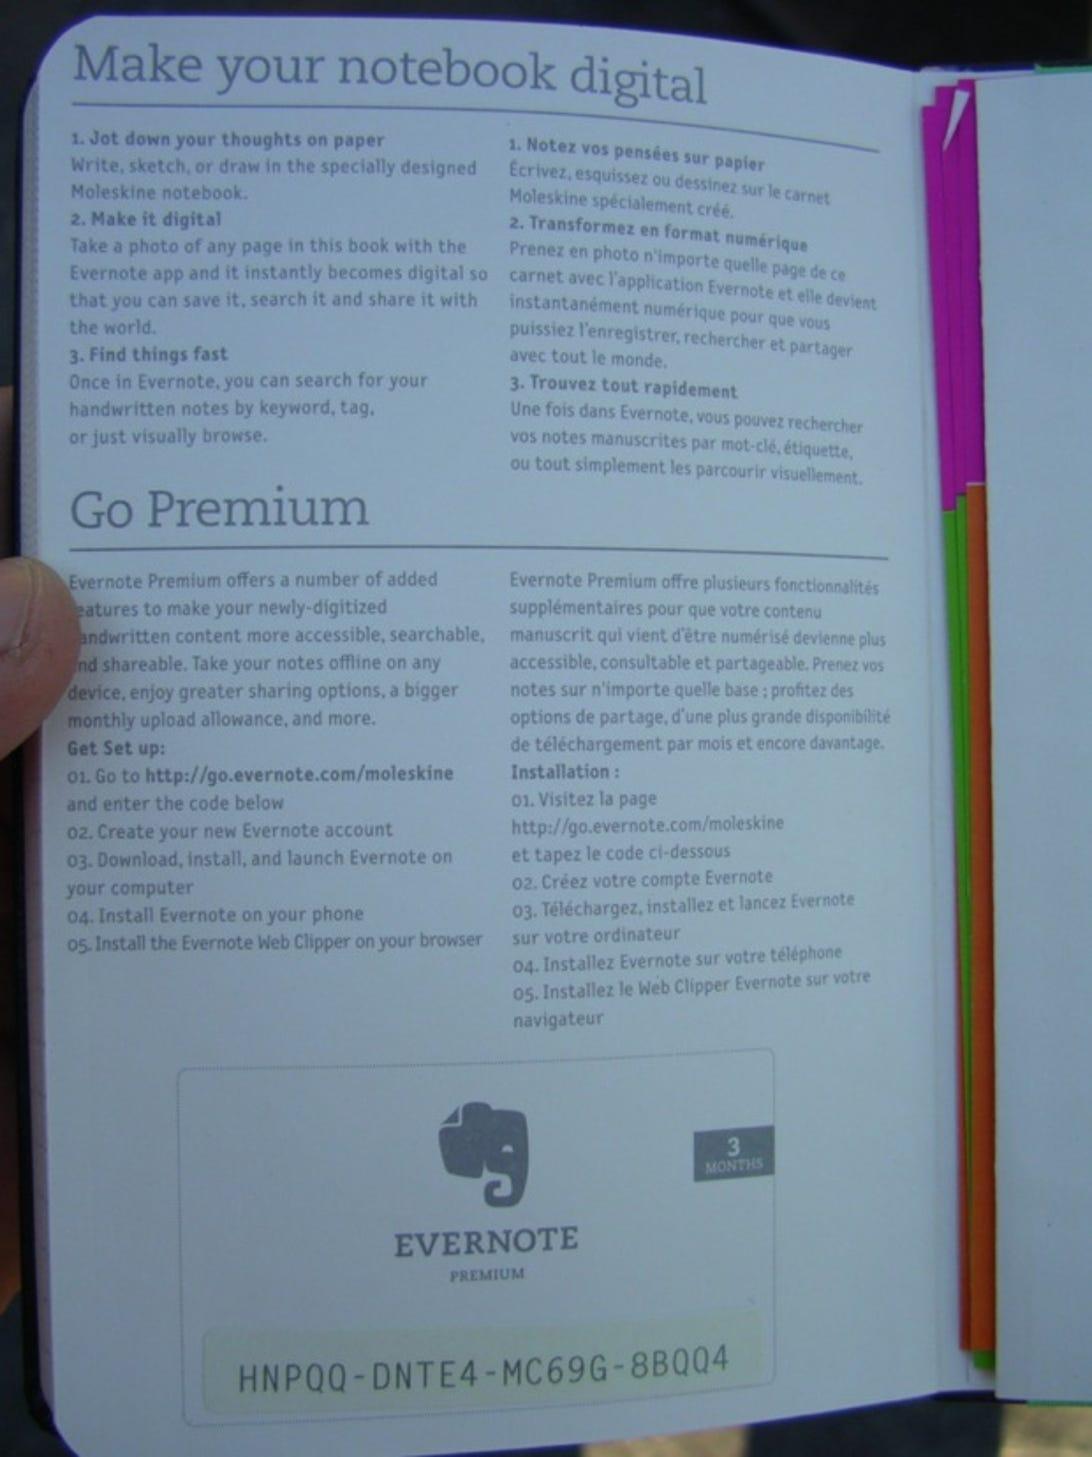 evernotesmartnotebook06.jpg